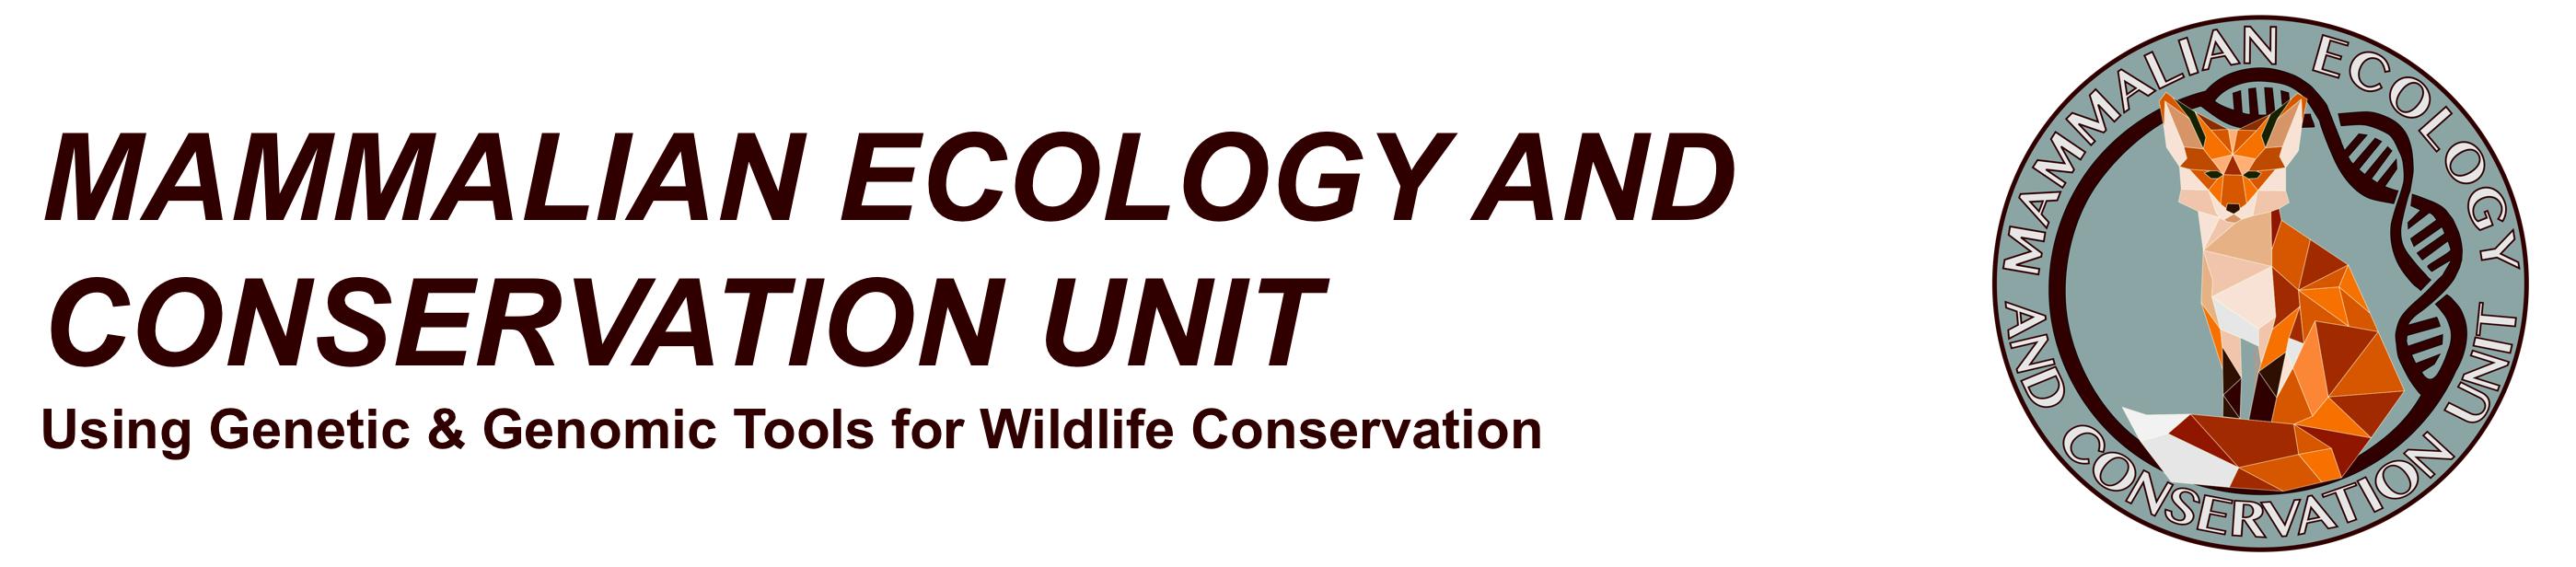 Mammalian Ecology and Conservation Unit